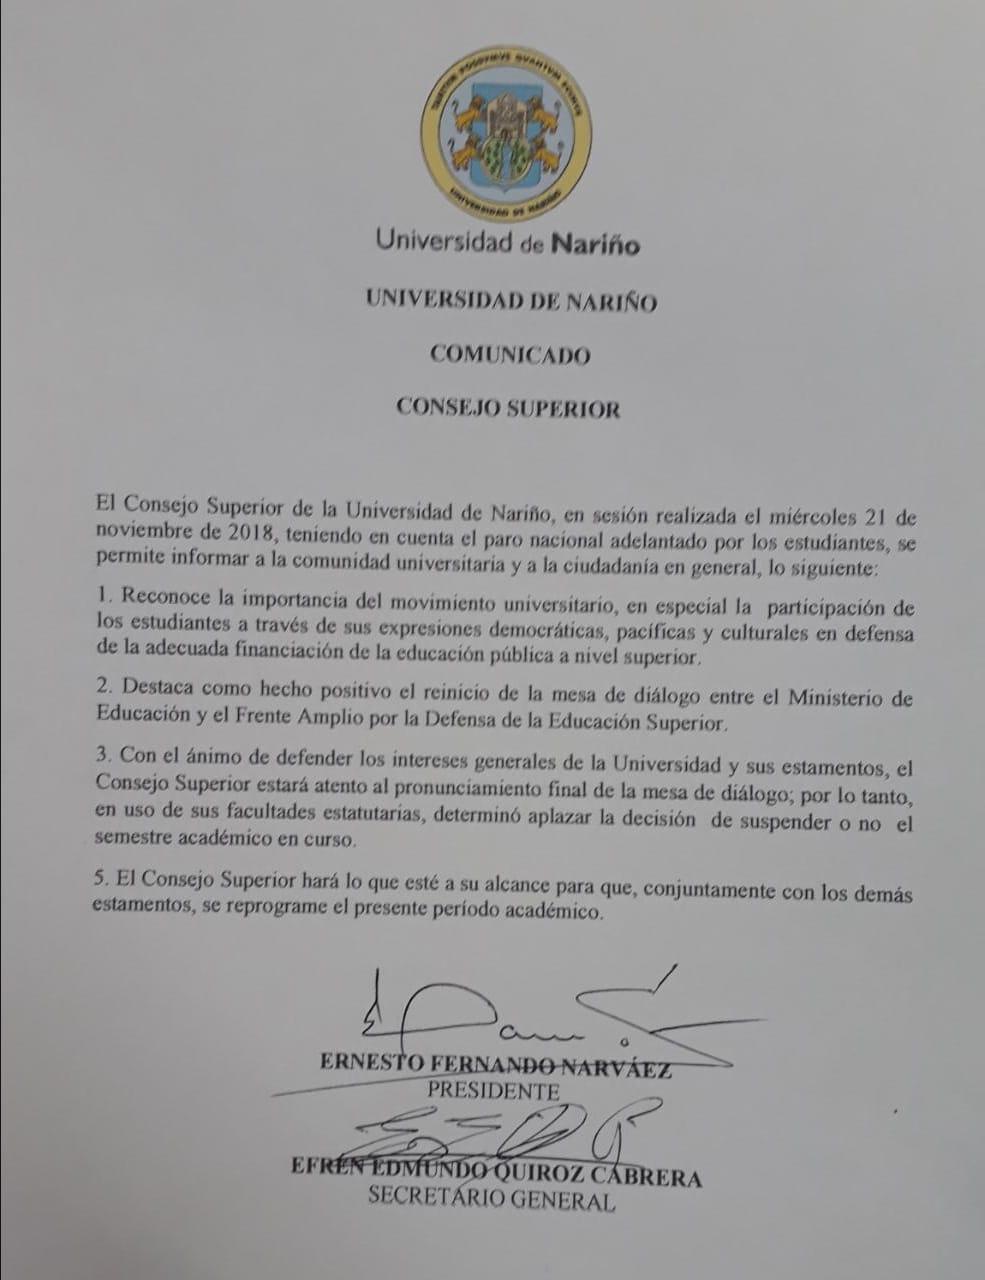 https://periodico.udenar.edu.co/wp-content/uploads/2018/11/comunicado-consejo-superior-1.jpeg